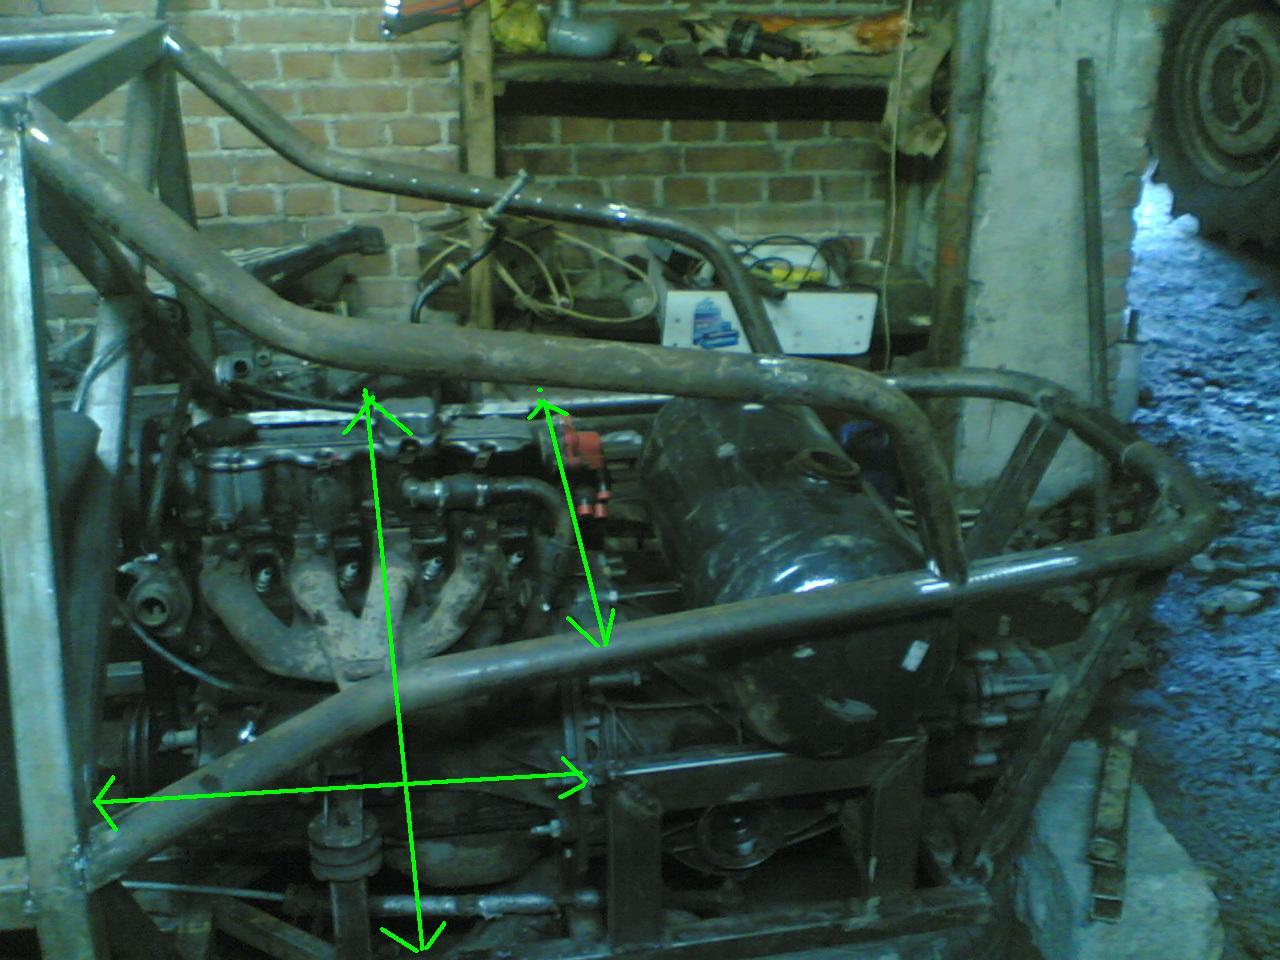 c25xe aah abc 6a13 - Tani SWAP kt�ry? V6 audi 2.6 2.8, Opel 2.5, Galant 2.5